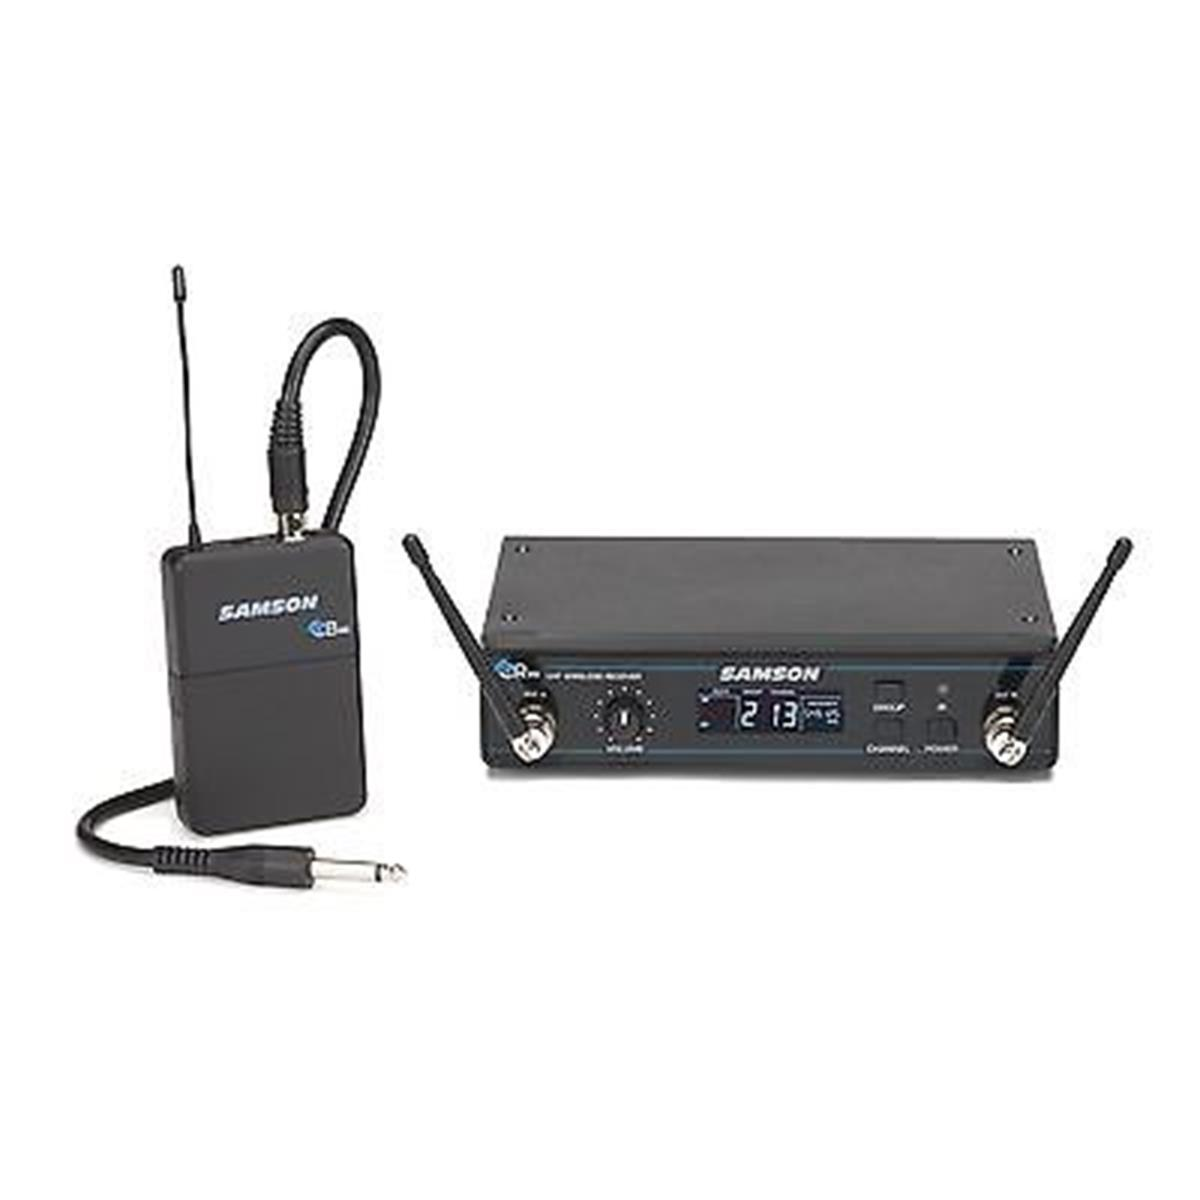 Samson CONCERT 99 UHF Guitar System - C (638-662 MHz)